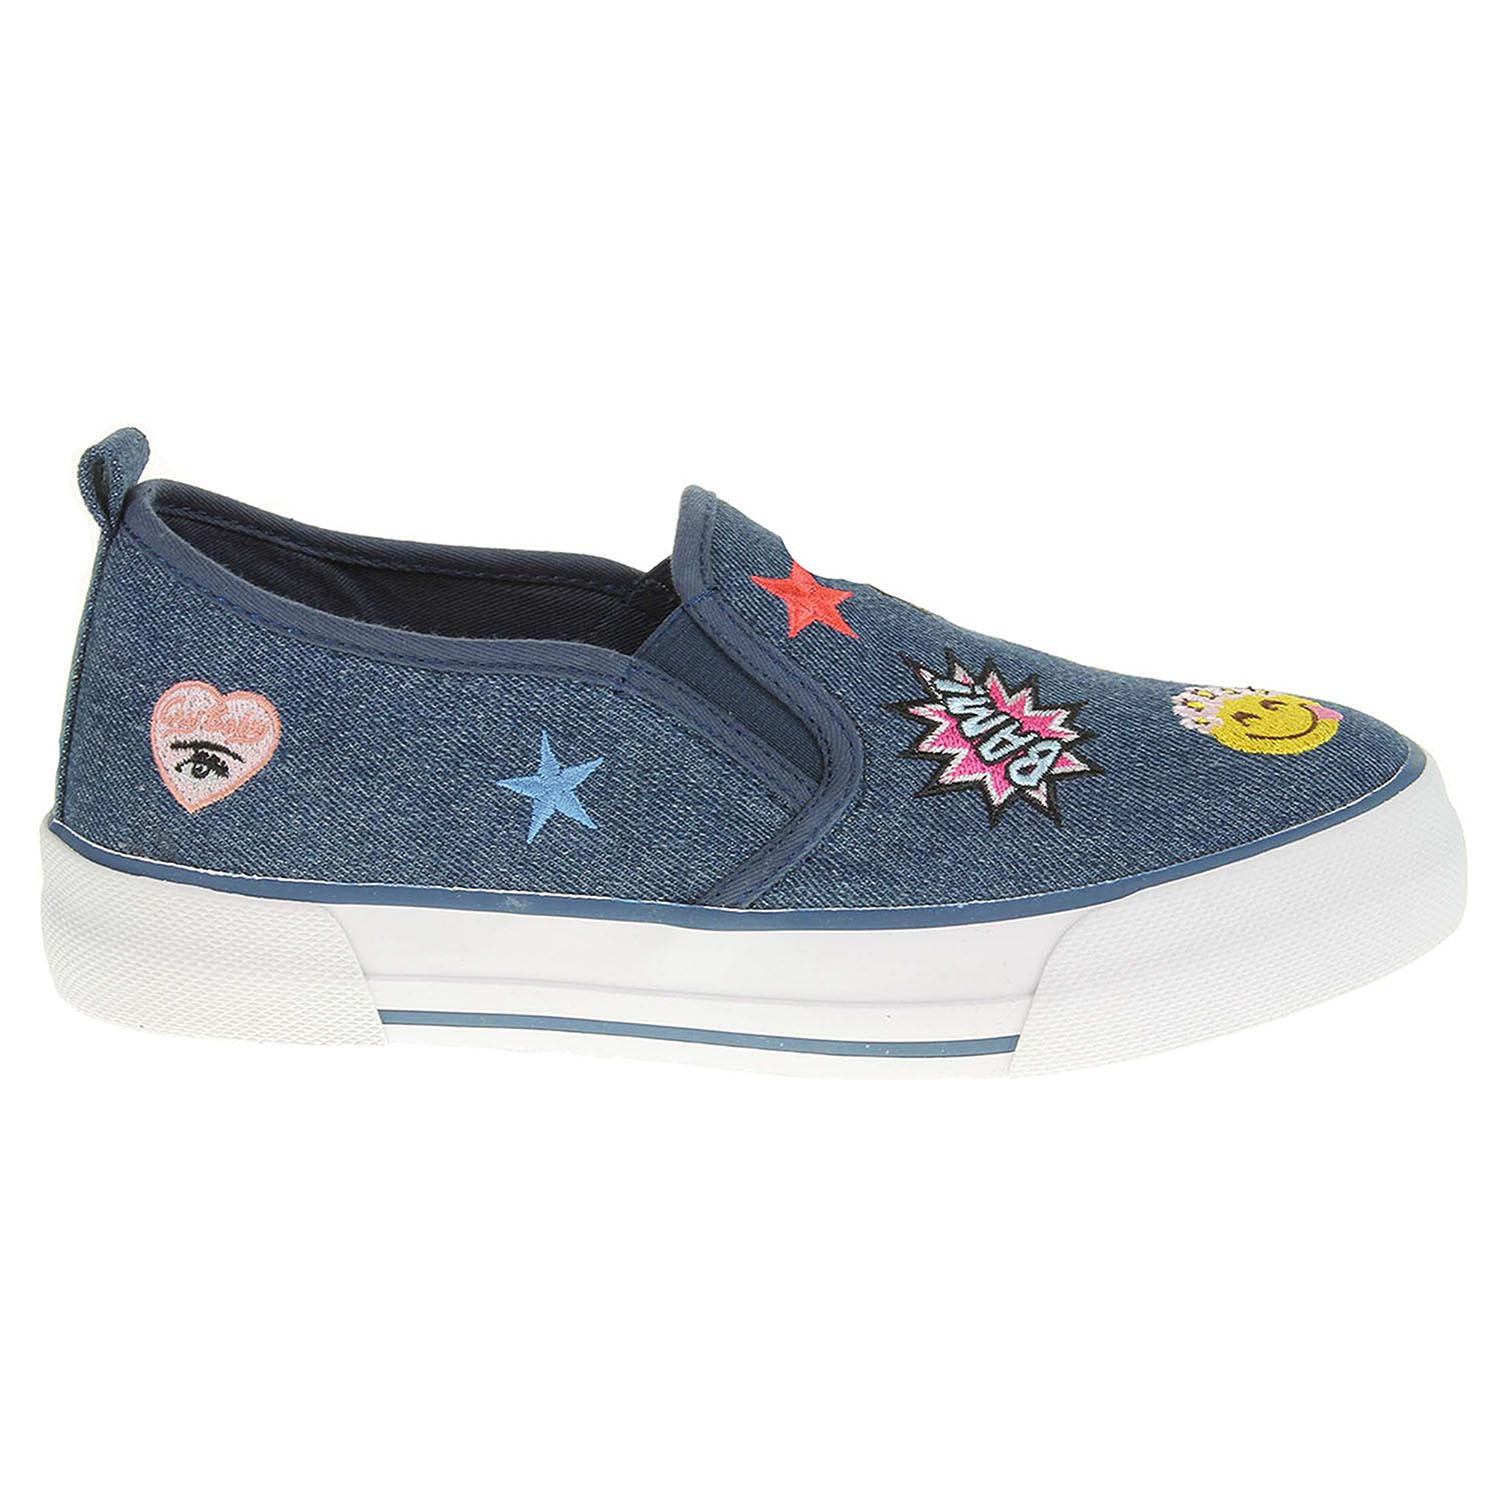 6d79c1876b3 Ecco Marco Tozzi dámská obuv 2-24618-38 modrá 23200650